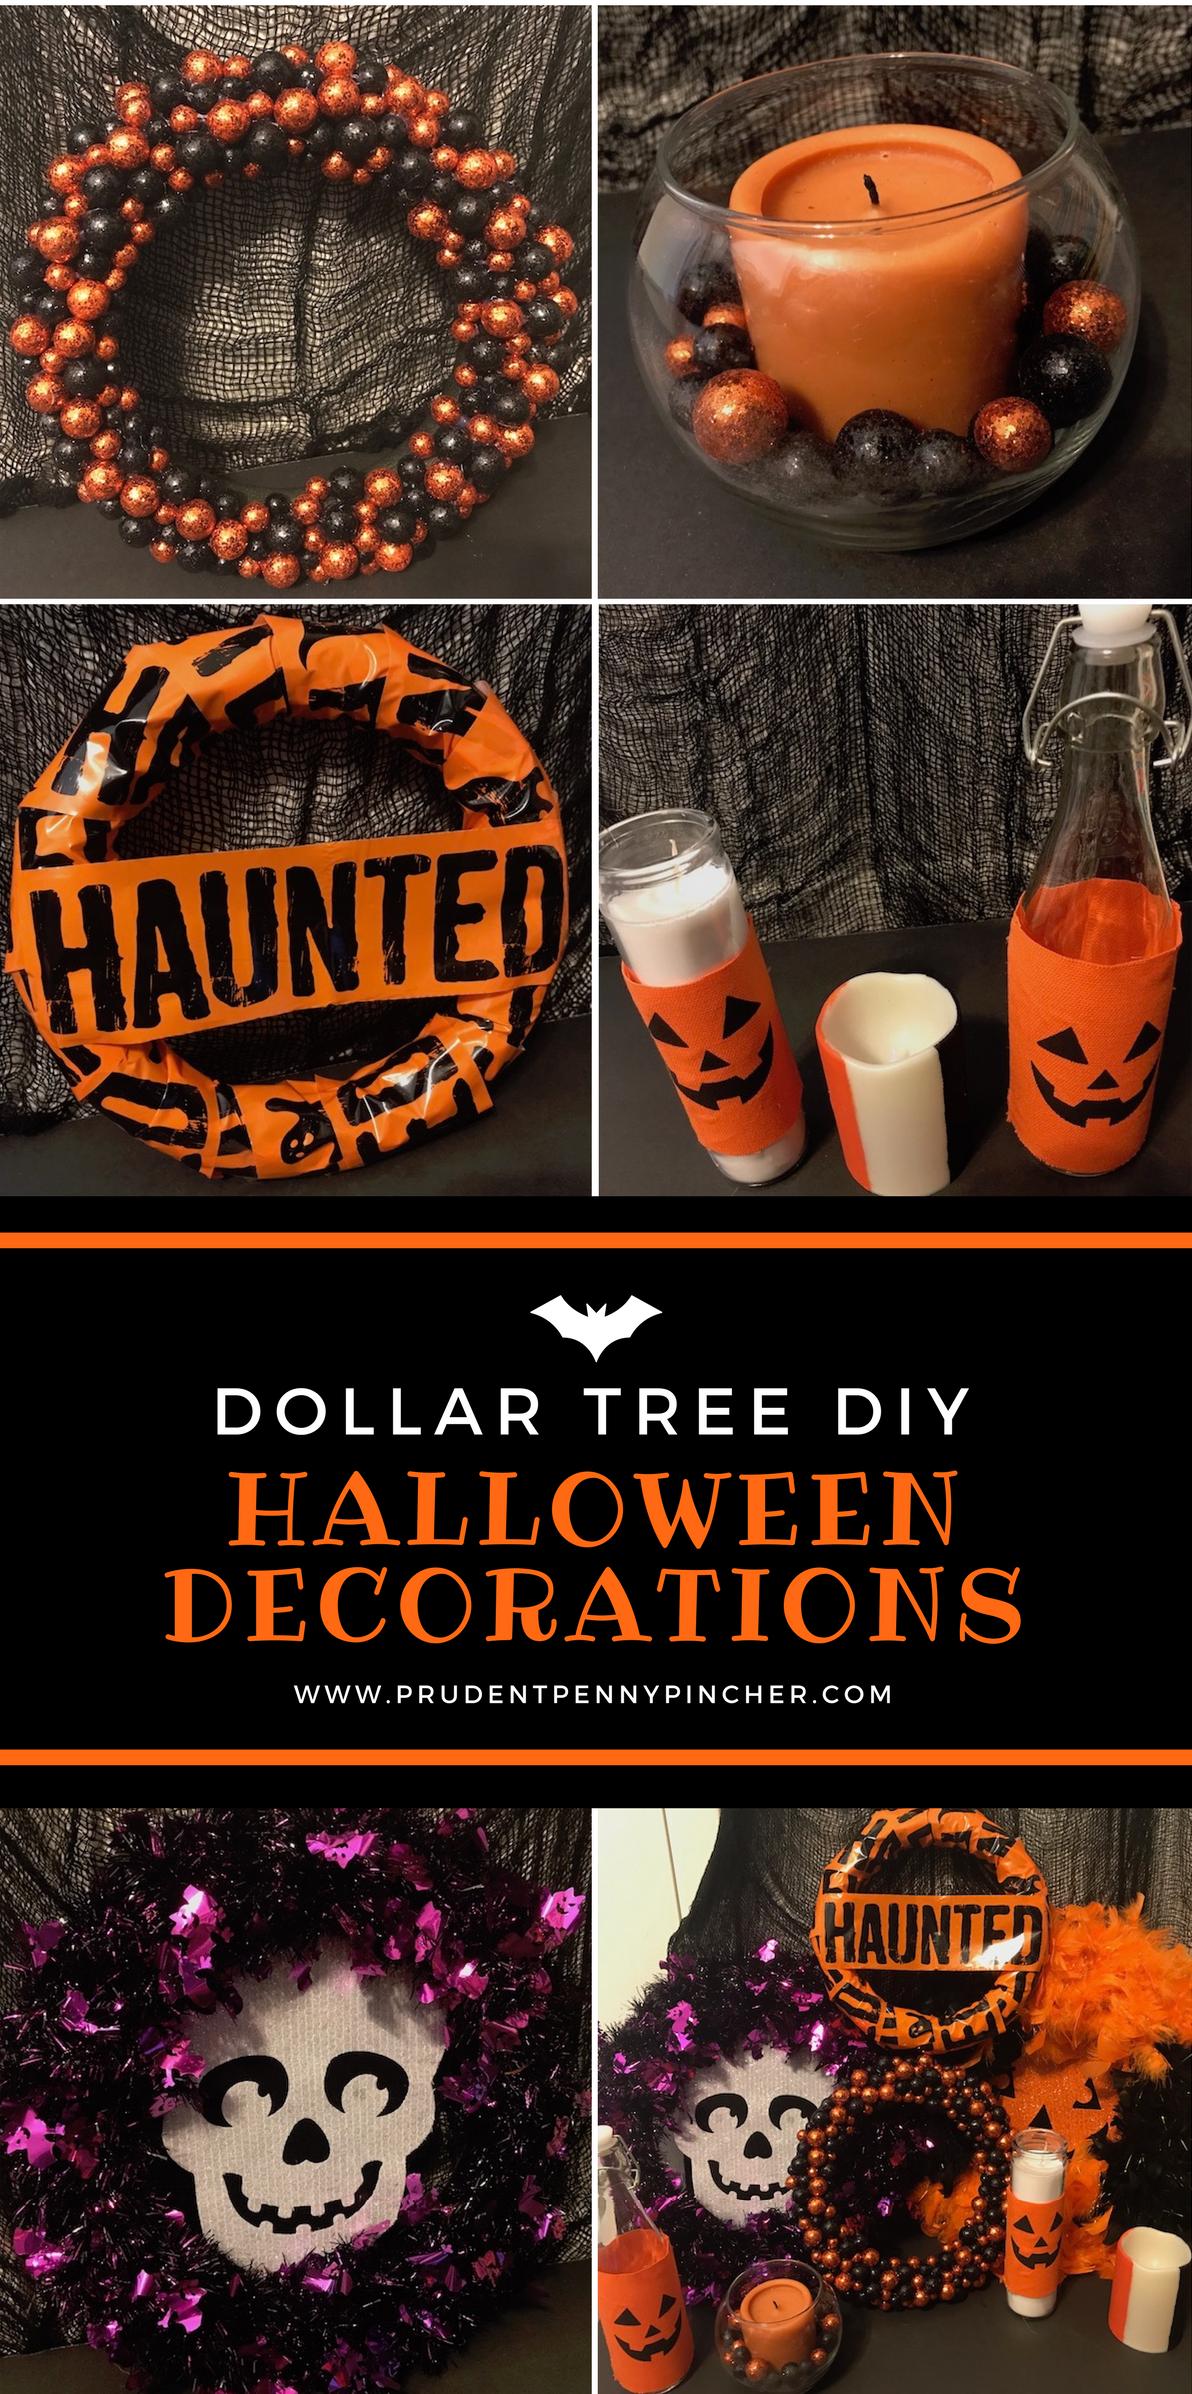 Dollar Tree Halloween Decorations